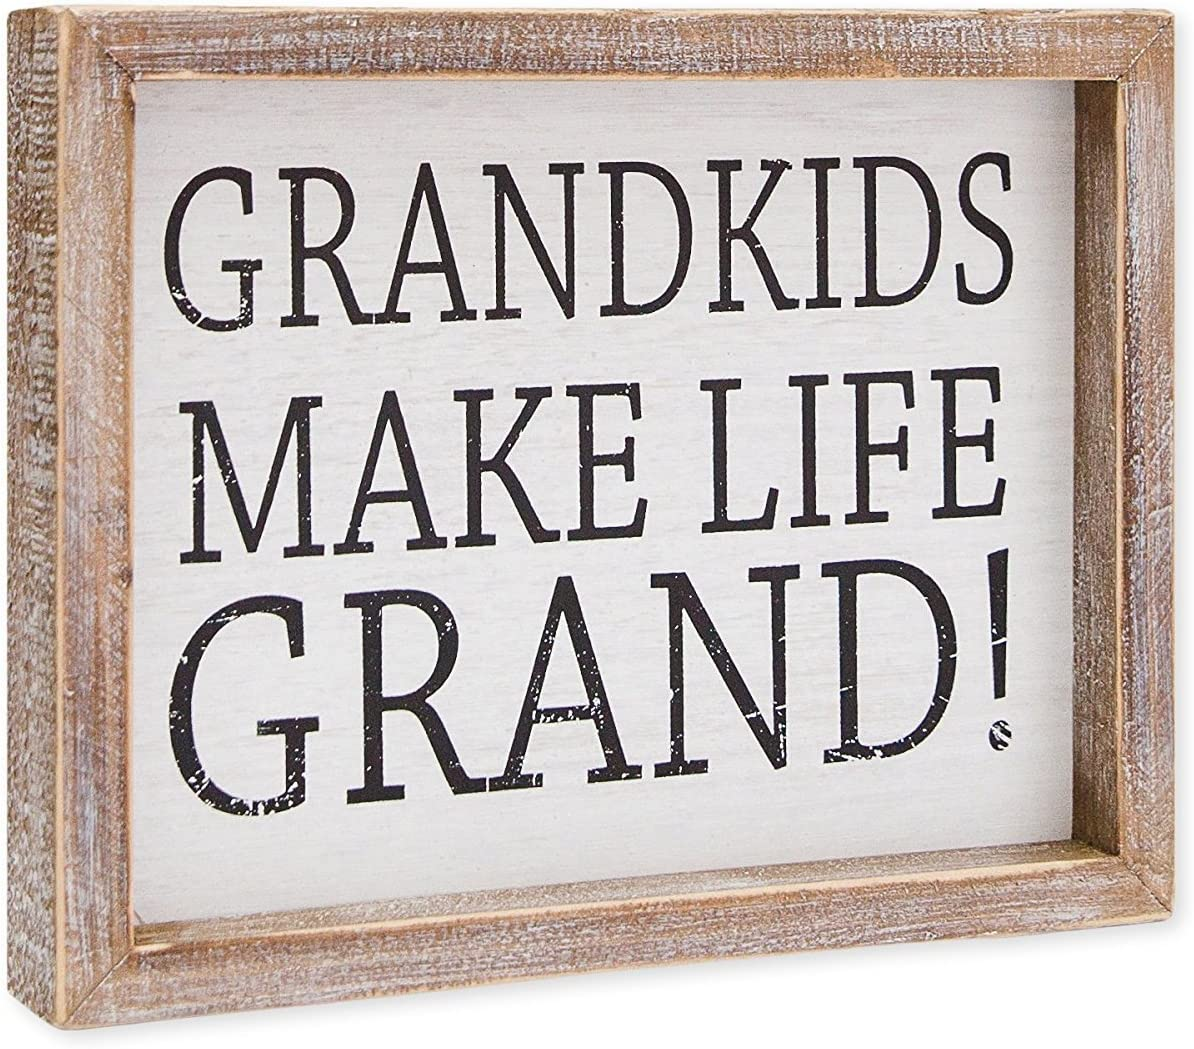 "9"" X 7"" X 1.5"" Framed Sign (Grandkids Make Life Grand!) White/Black - Model Number - 18970"